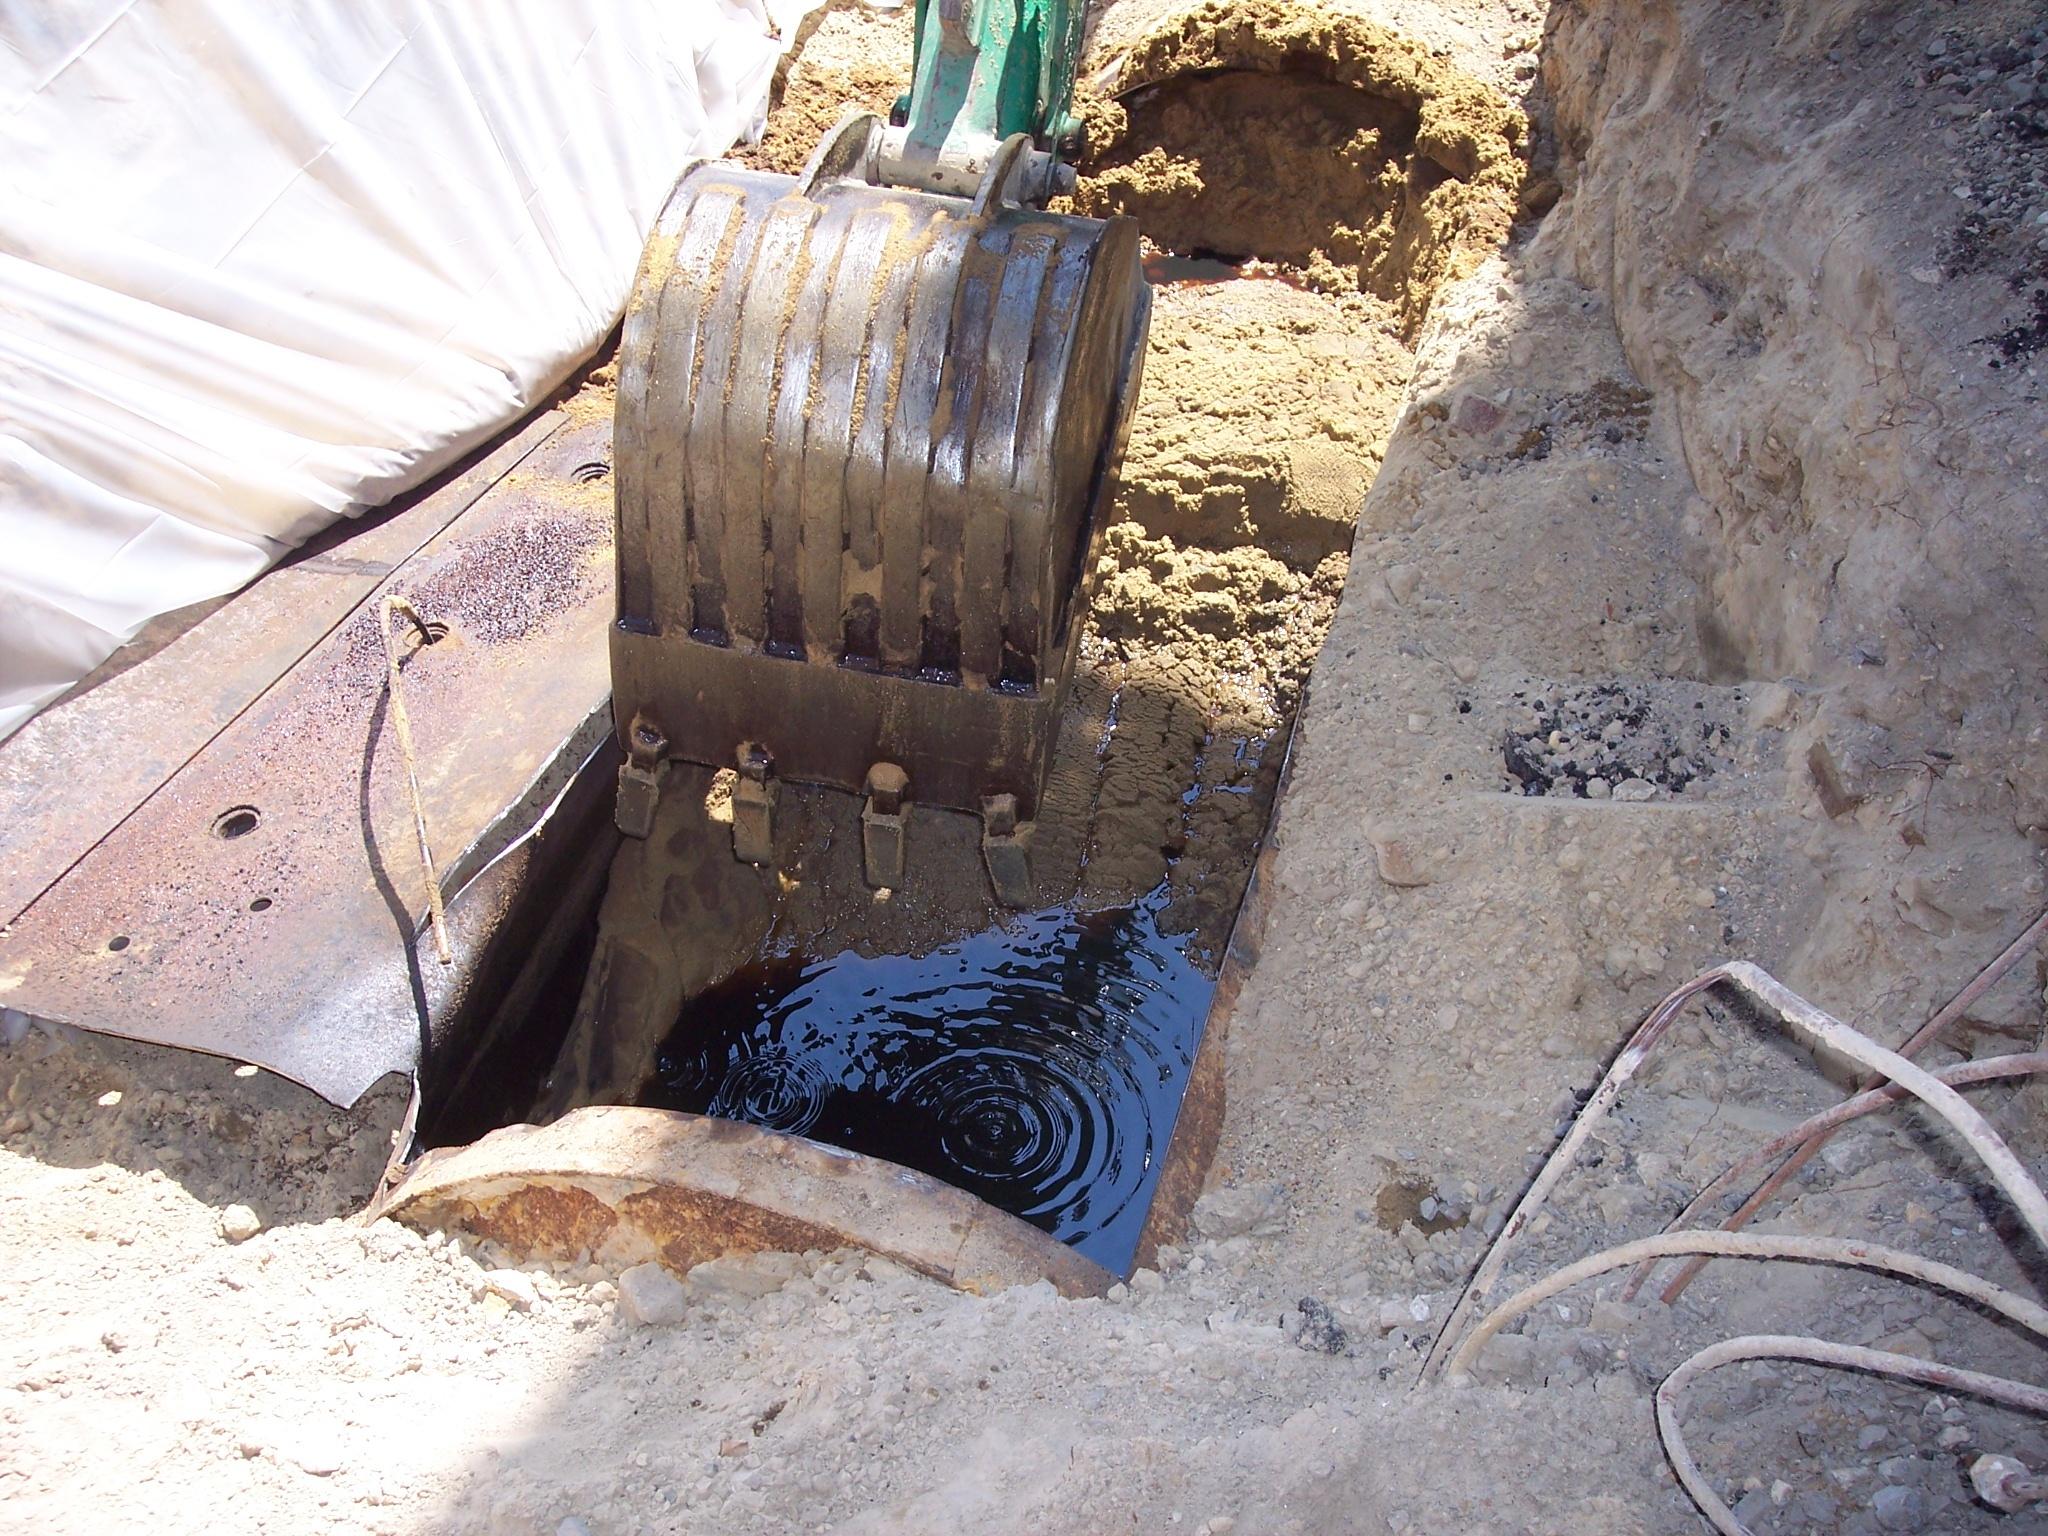 oil found in sand filled tank.jpg